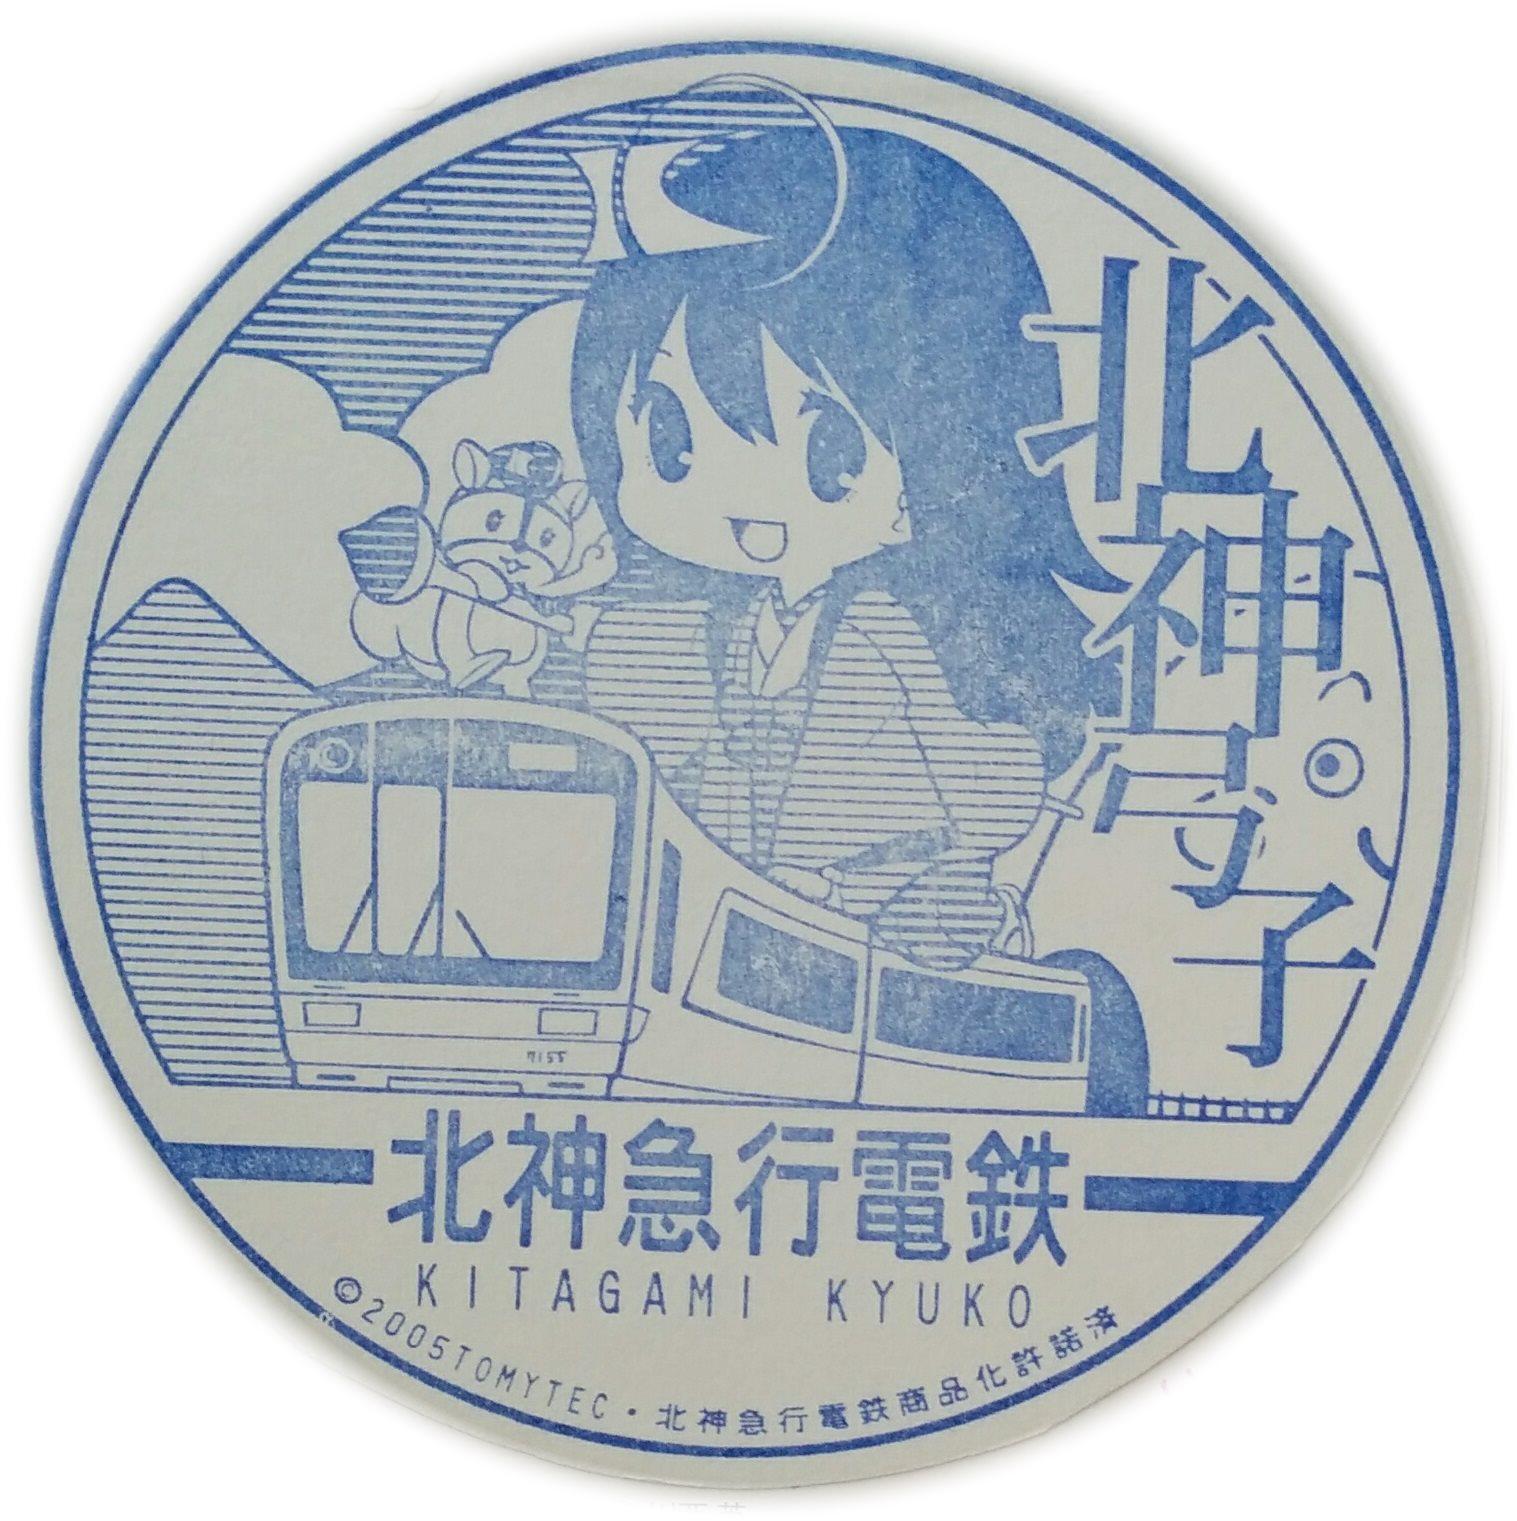 http://humi.sakura.ne.jp/paco/wp-content/uploads/2016/12/%E5%8C%97%E7%A5%9E%E5%BC%93%E5%AD%90.jpg